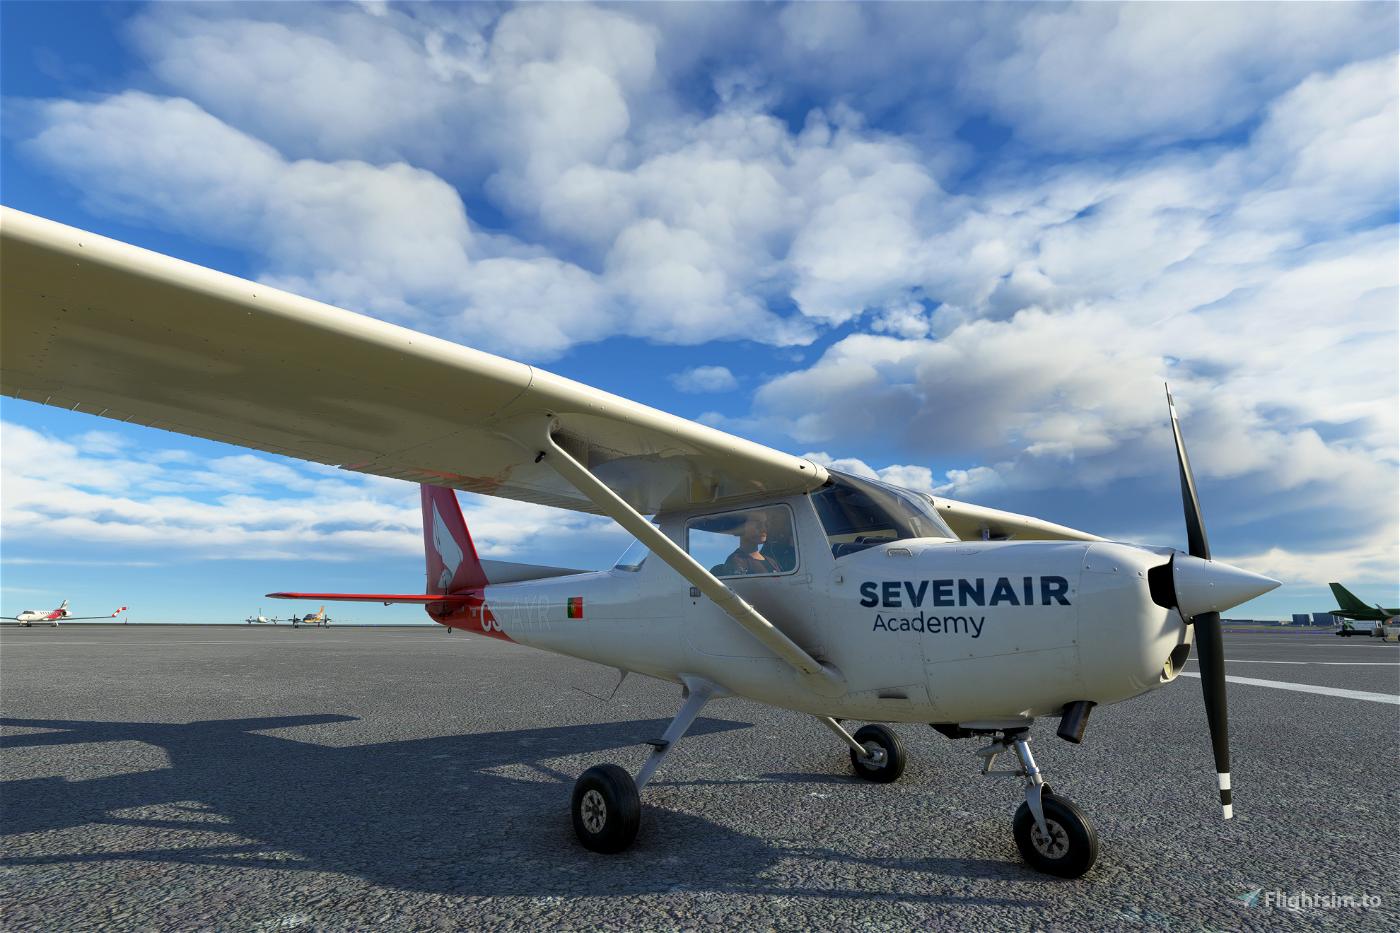 Cessna 152 Sevenair Academy